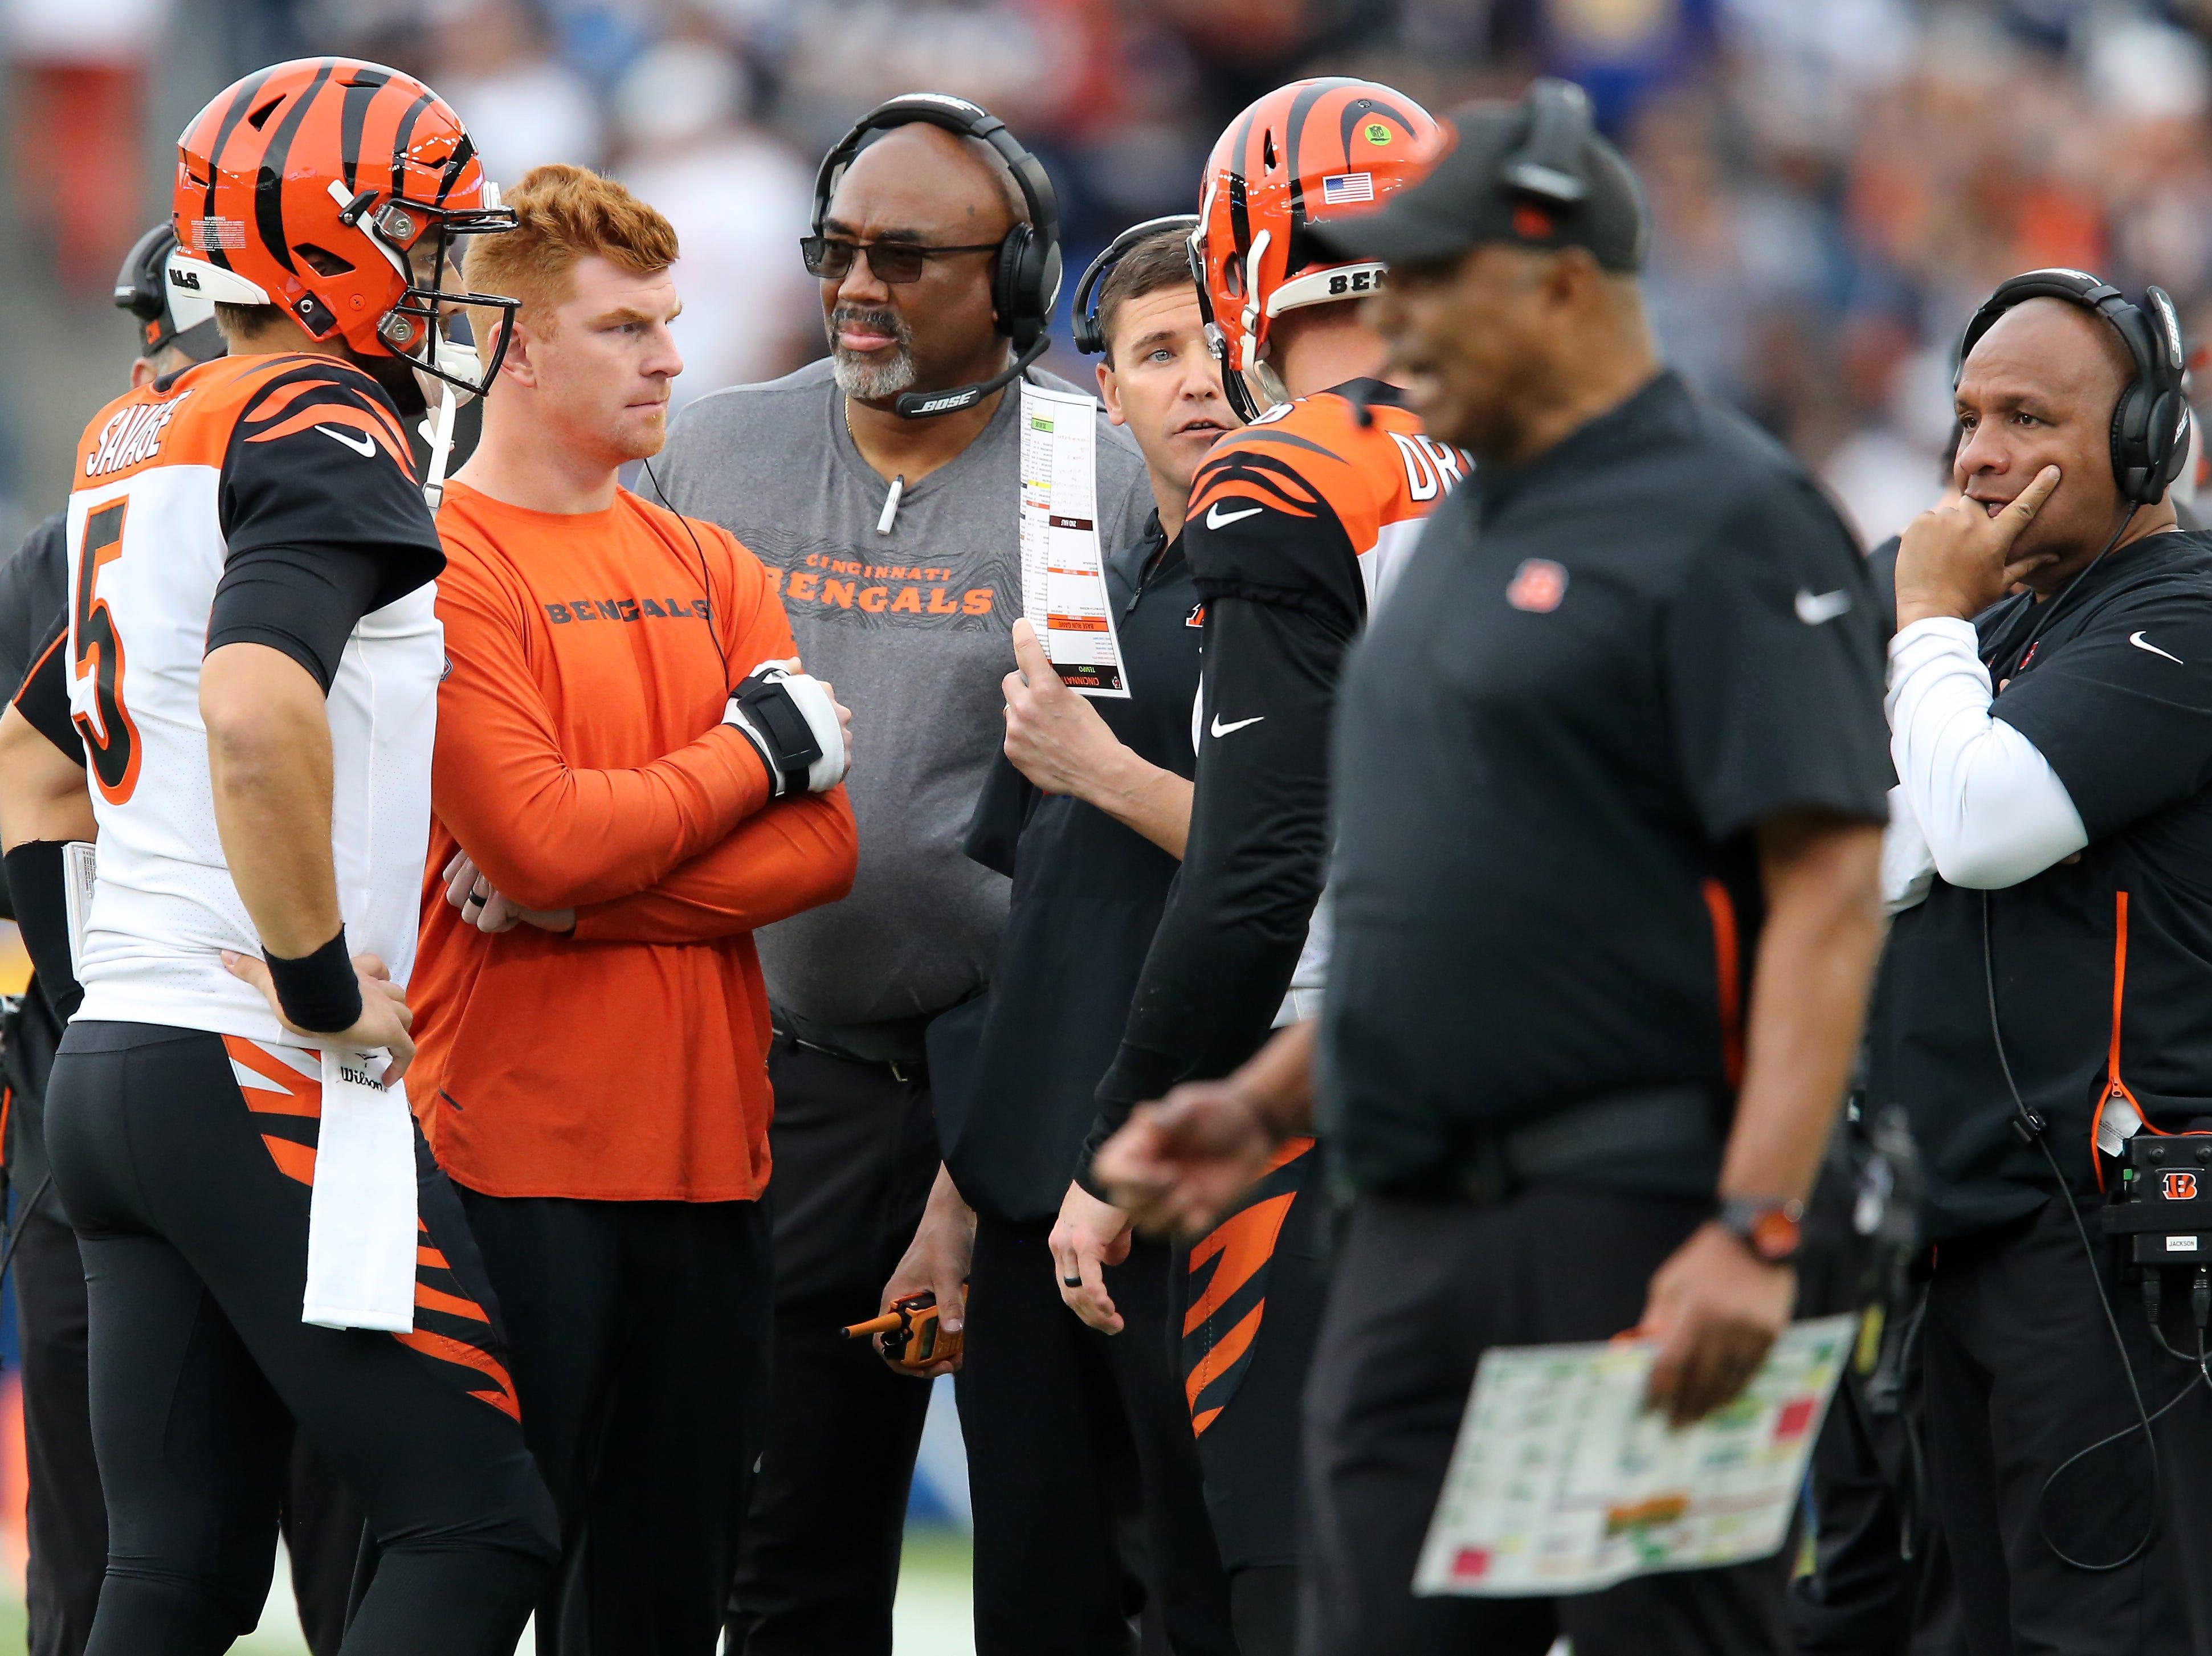 Cincinnati Bengals offensive coordinator Bill Lazor, center, talks with Cincinnati Bengals quarterback Jeff Driskel (6) in the fourth quarter of a Week 14 NFL football game, Sunday, Dec. 9, 2018, at StubHub Center in Carson, California. The Los Angeles Chargers won 26.21.